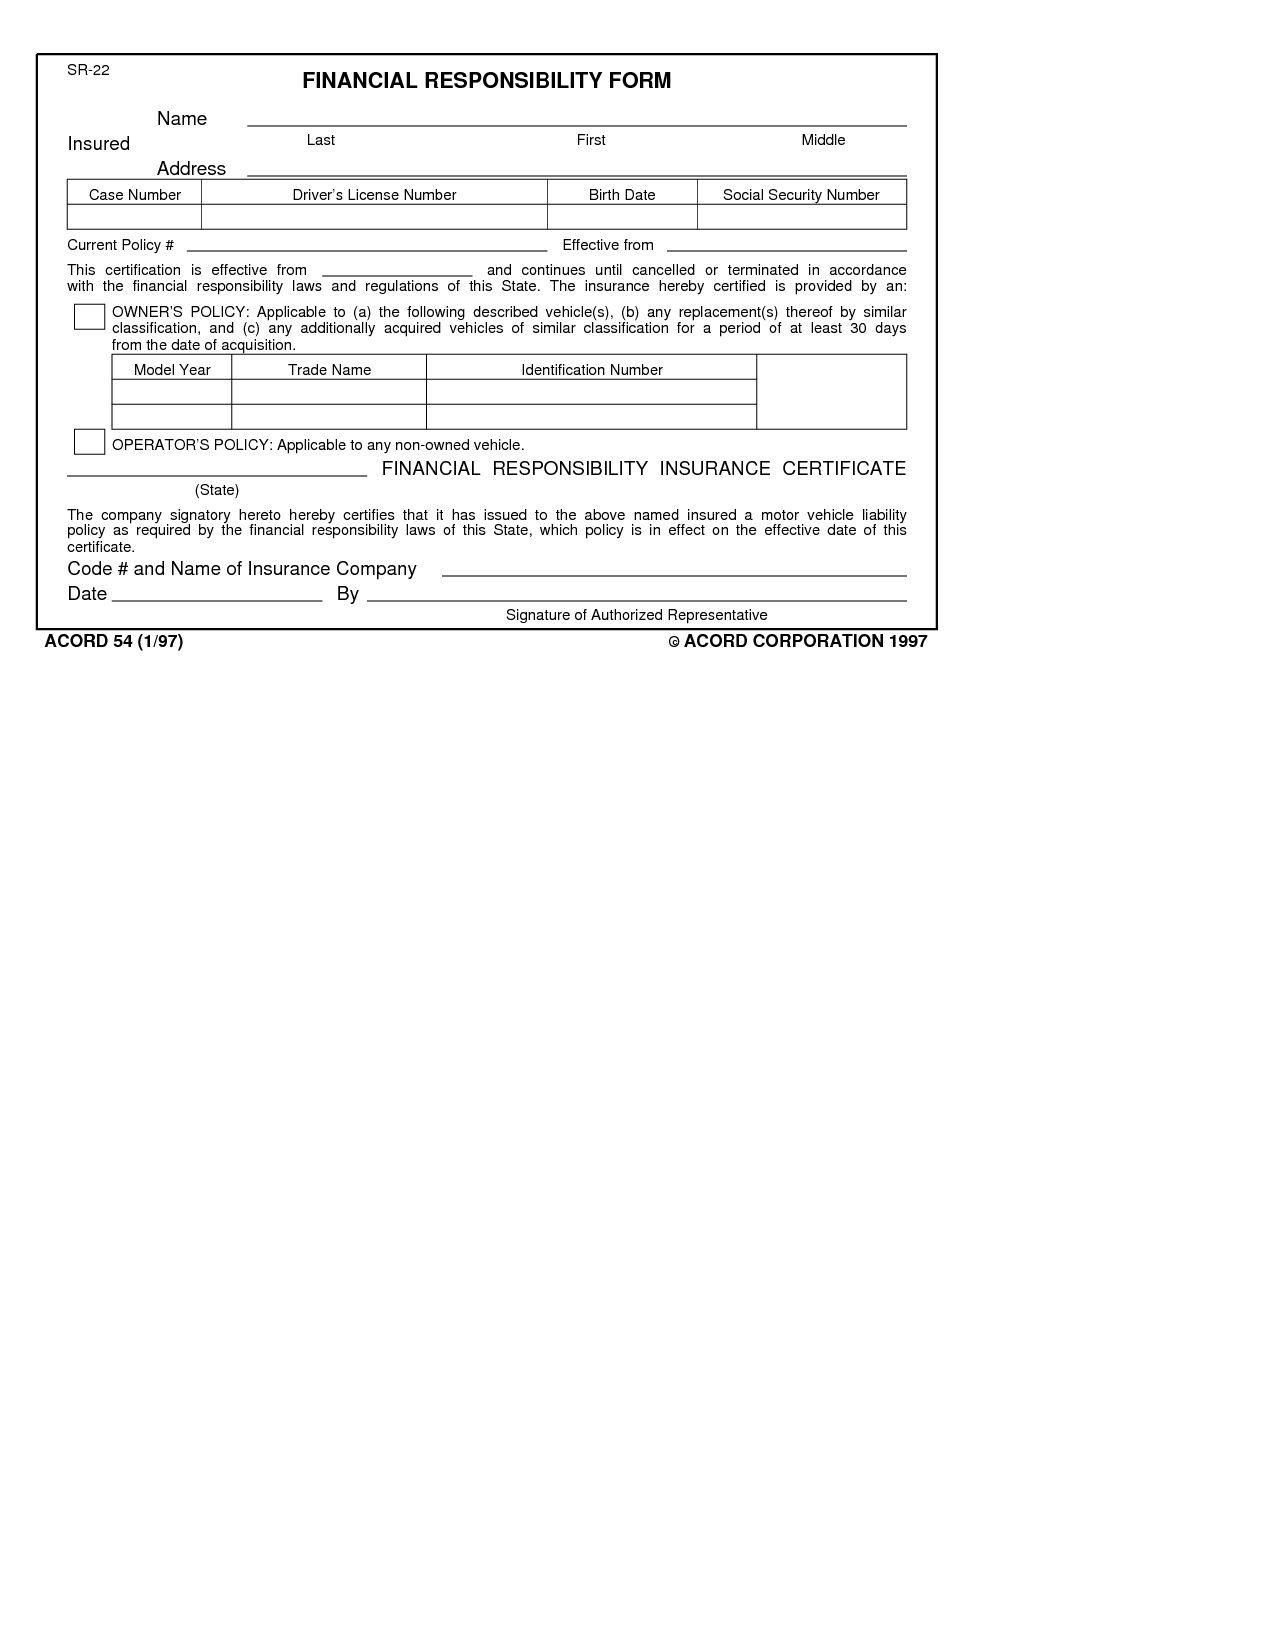 The astonishing Fake Insurance Card Capdat Acord Fill ...